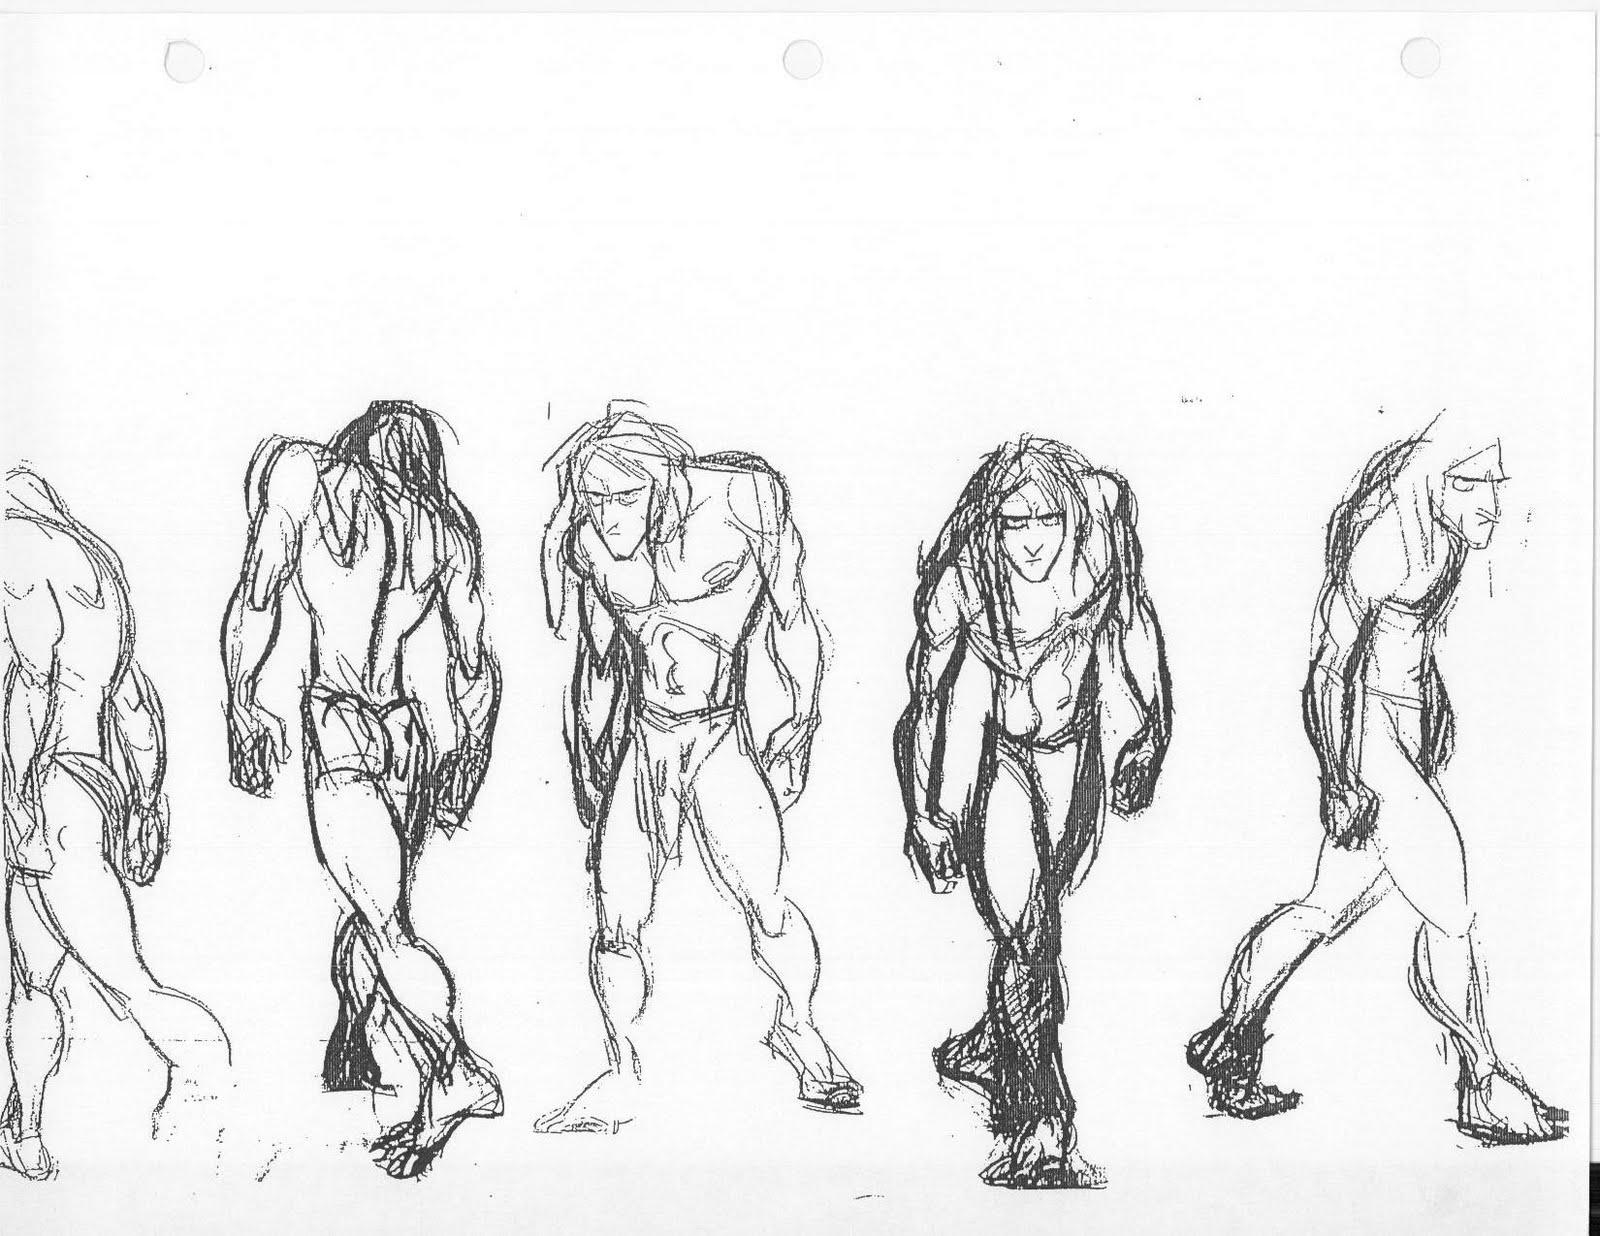 Glenn Keane 2c Tarzan Ruff Turnaround 2c Pencil